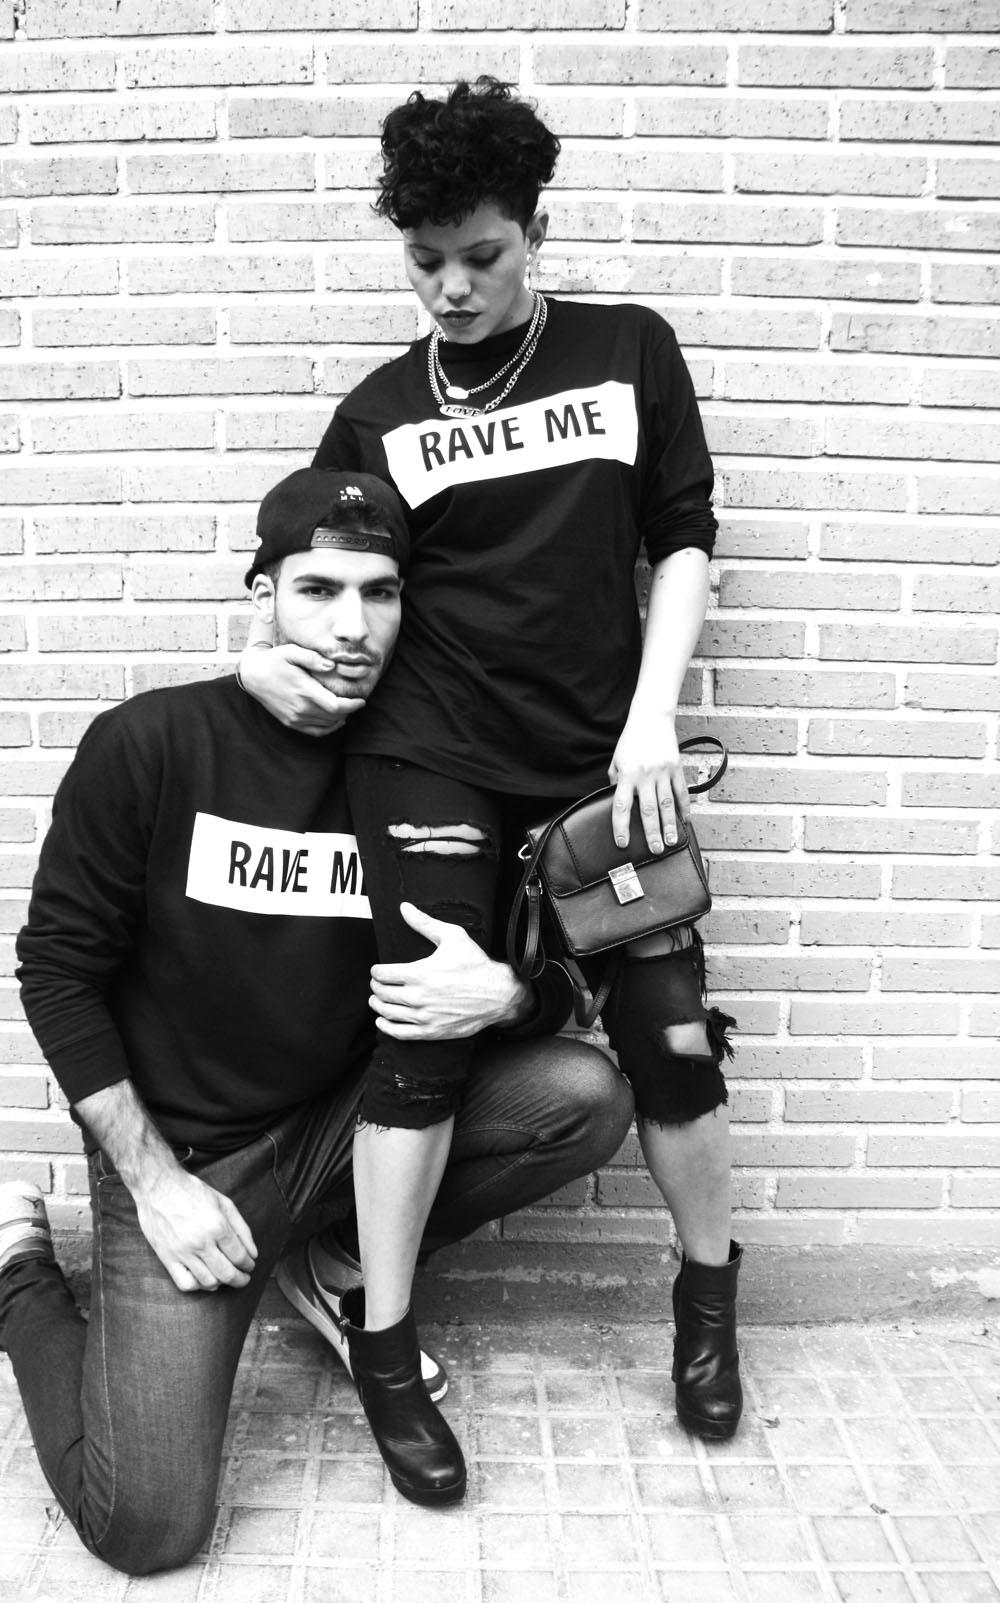 RAVE ME by RAVEMARKET